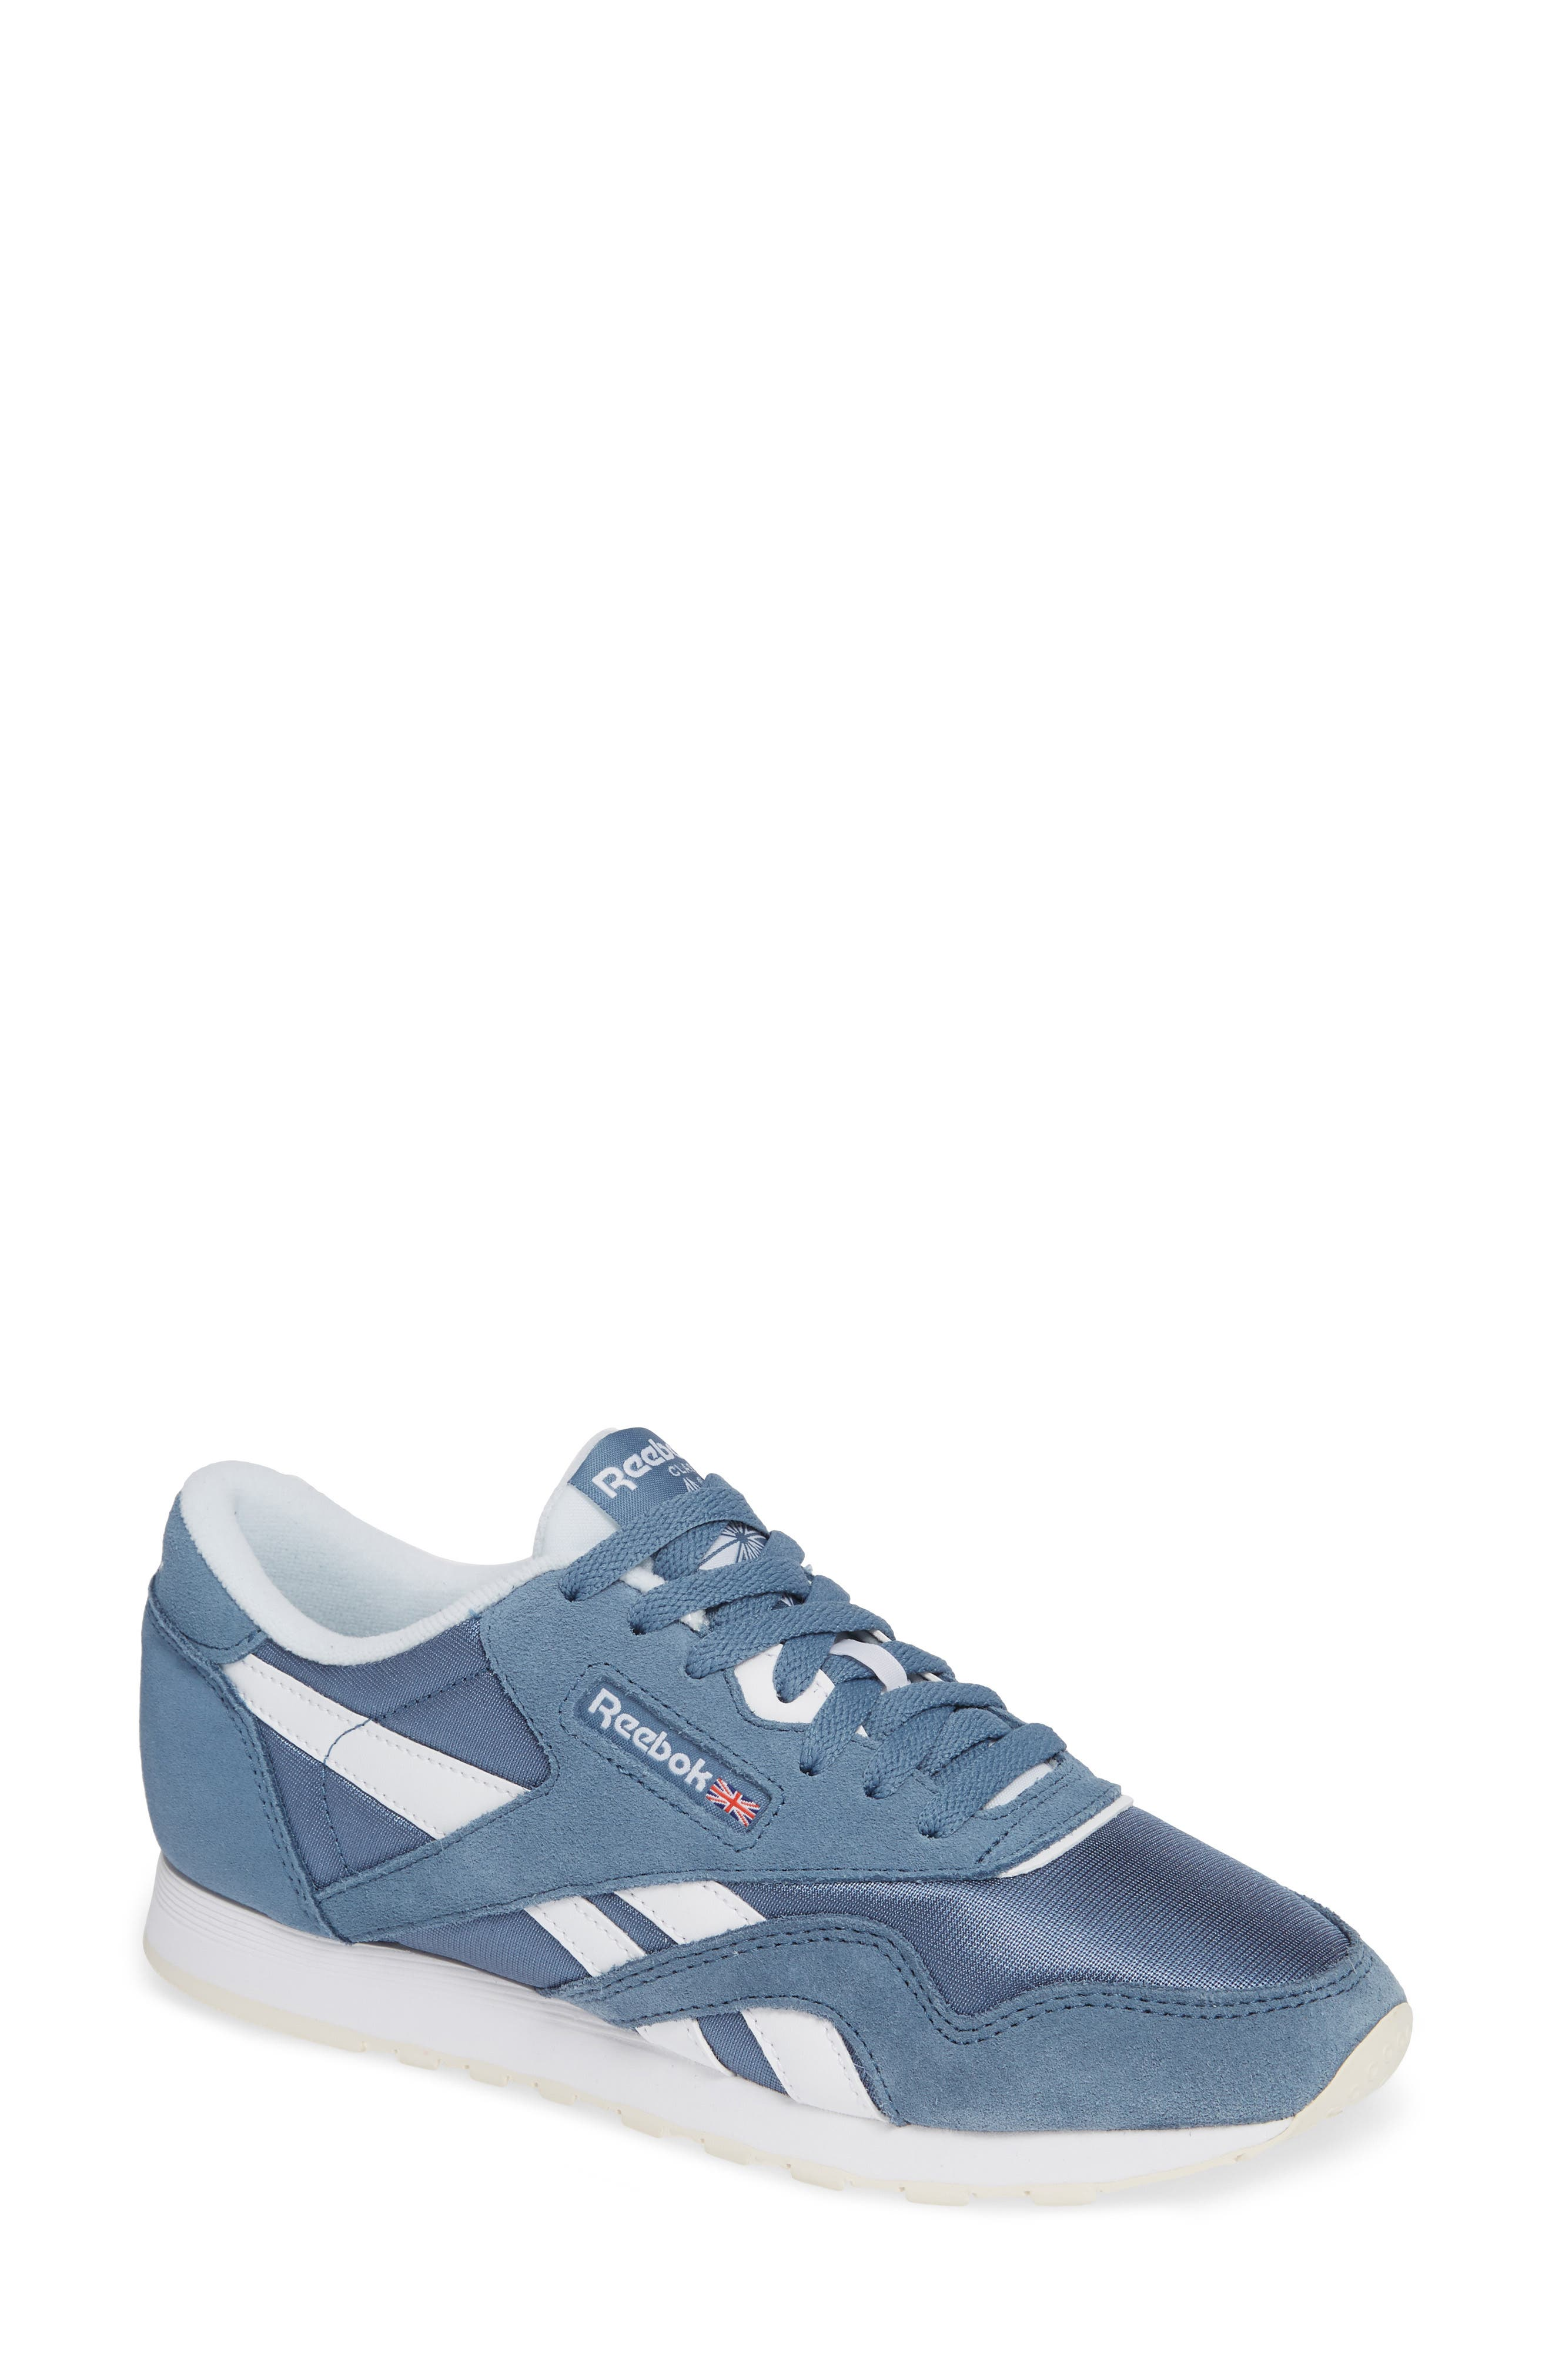 Classic Sneaker,                         Main,                         color, BLUE SLATE/ WHITE/ CHALK